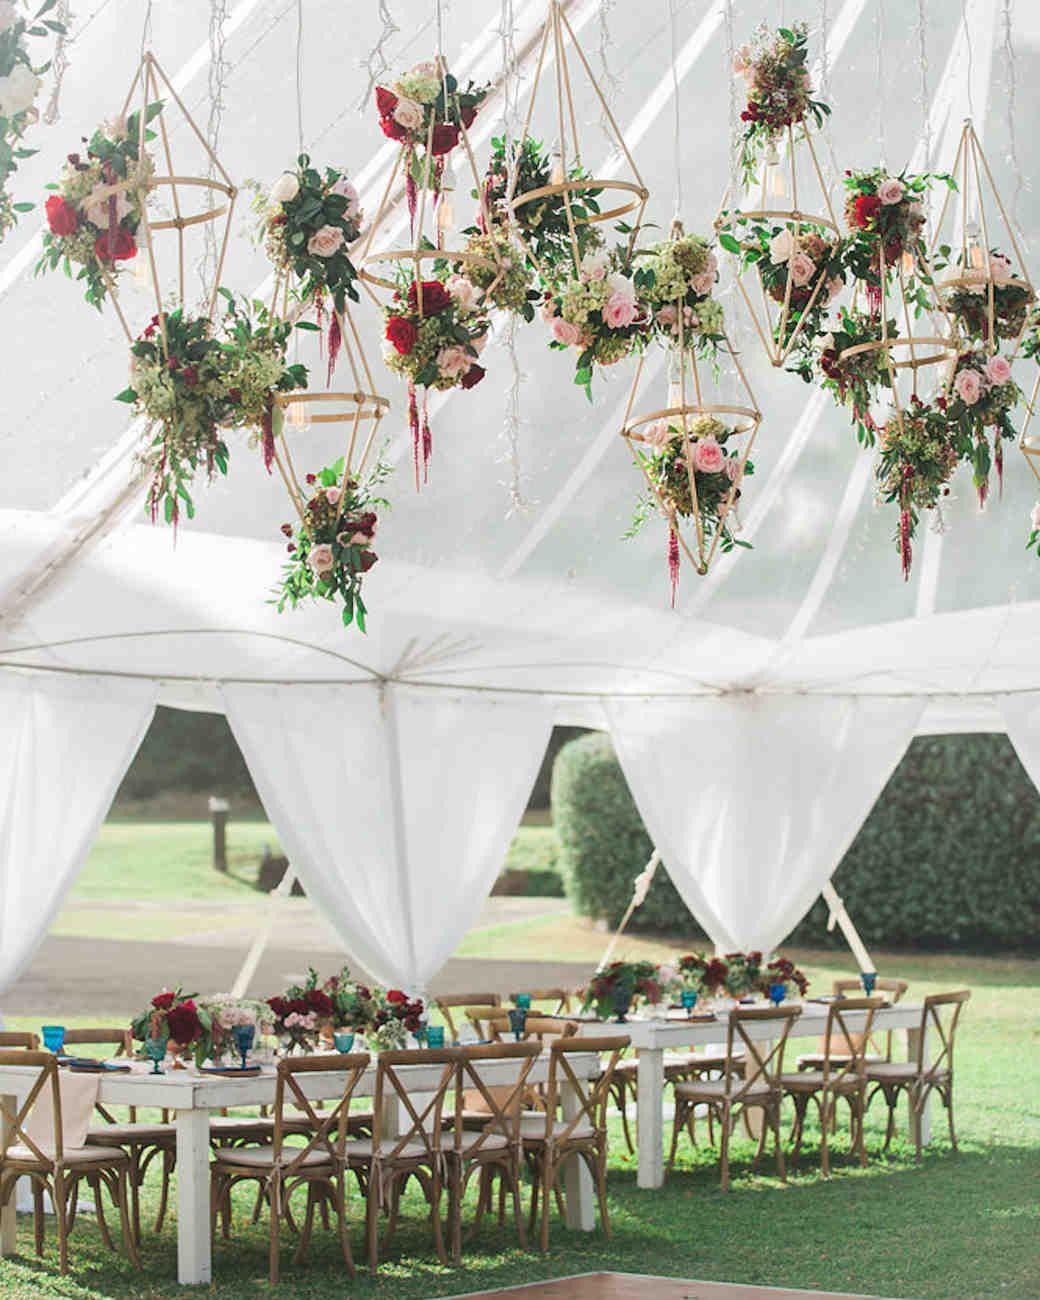 Stunning Backyard Engagement Party Decoration Ideas #engagementparty